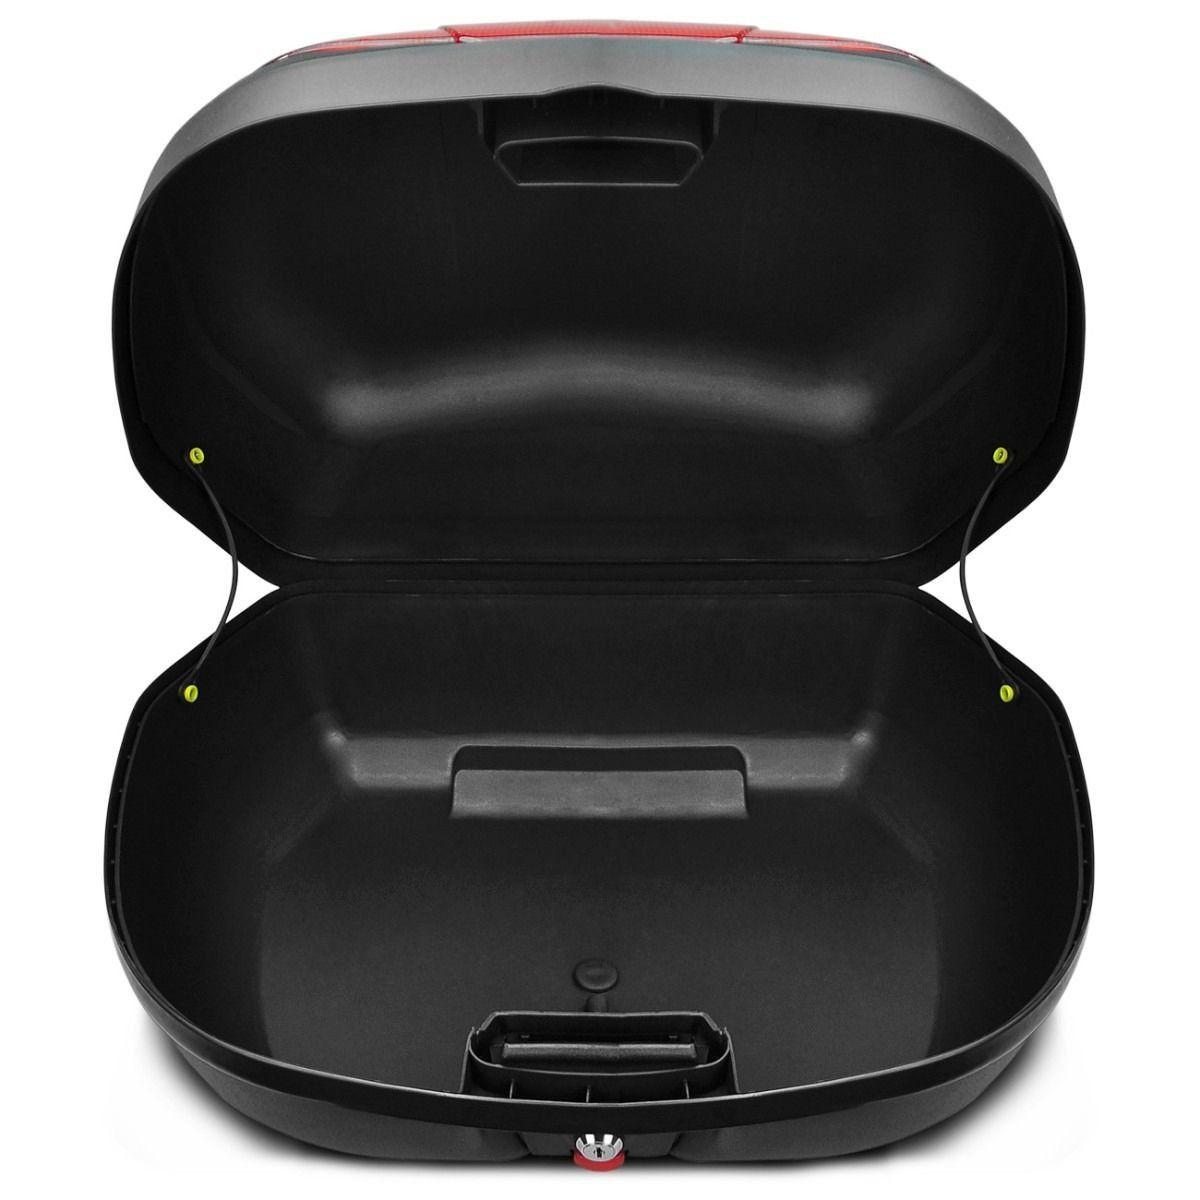 Bauleto 45L Smart Box Pro Tork  - Motorshopp